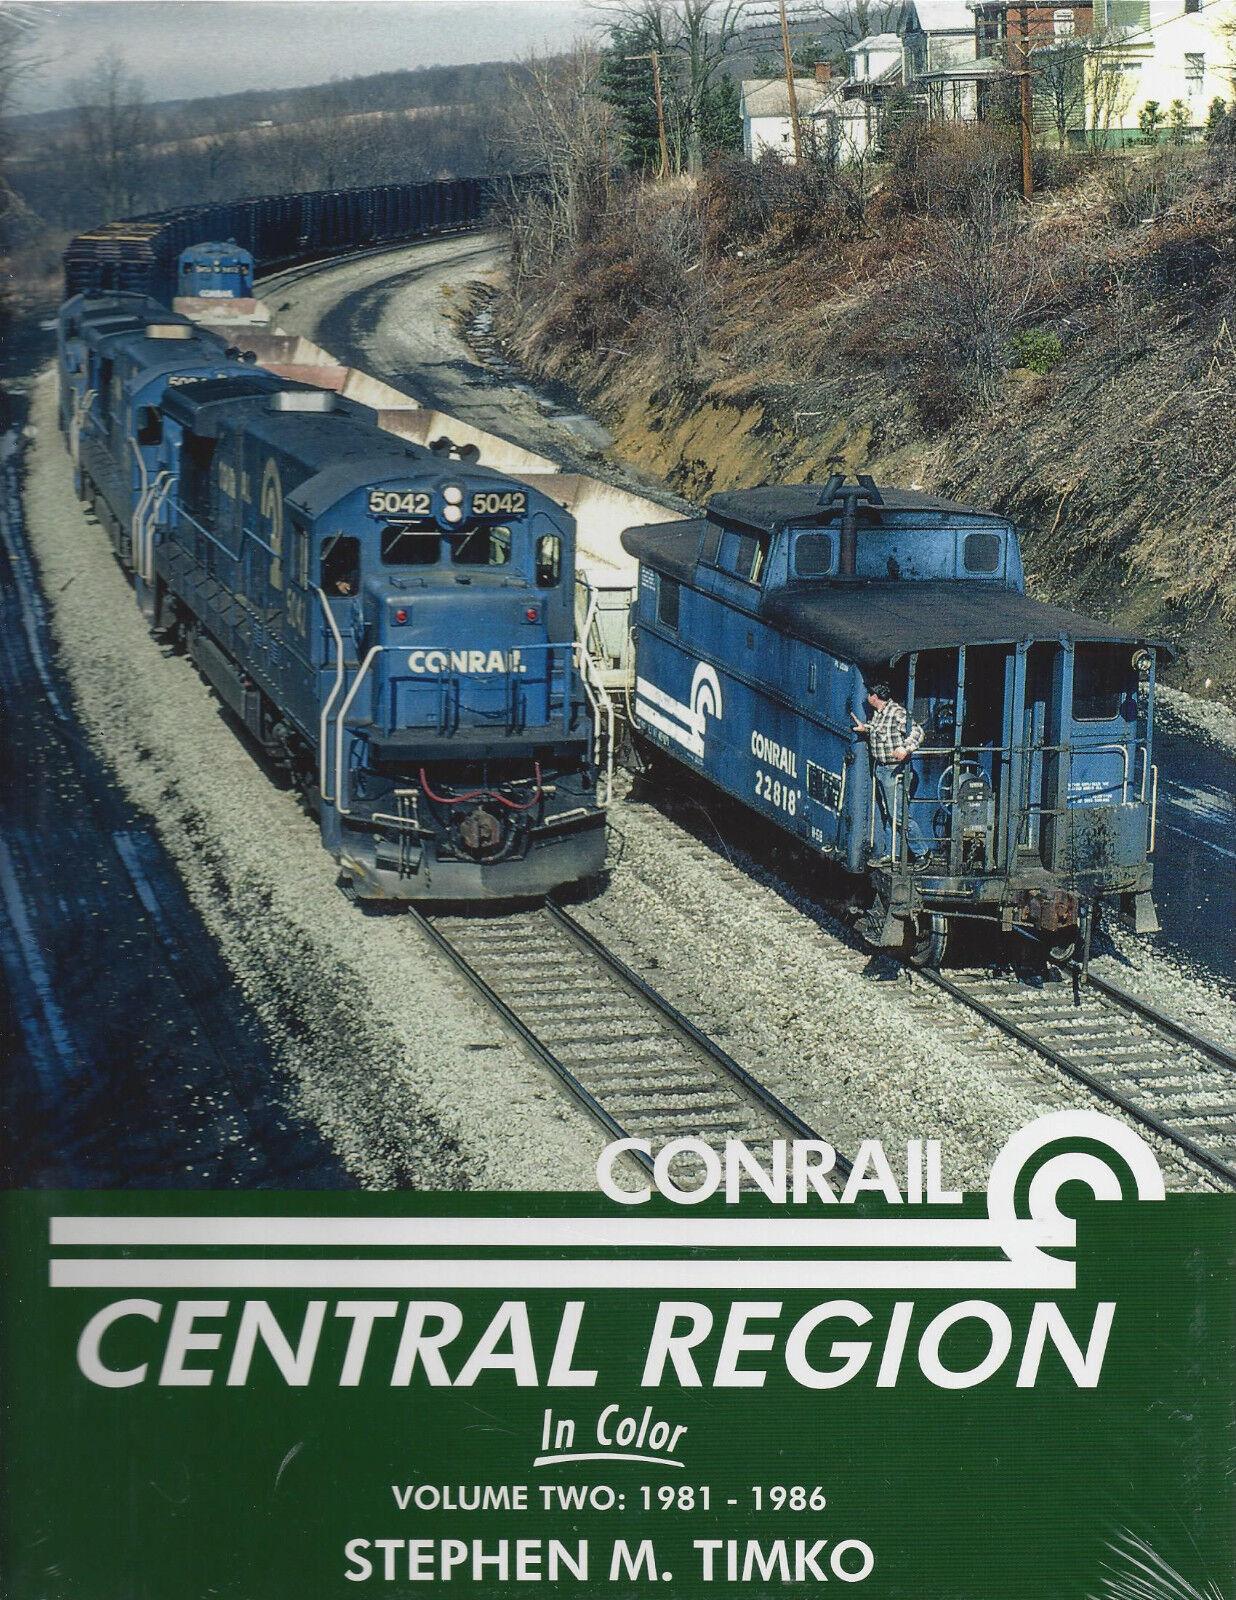 Conrail Centrale Regione, Vol. 2, 19811986, Harrisburg, Pa a Piedi Wayne, in